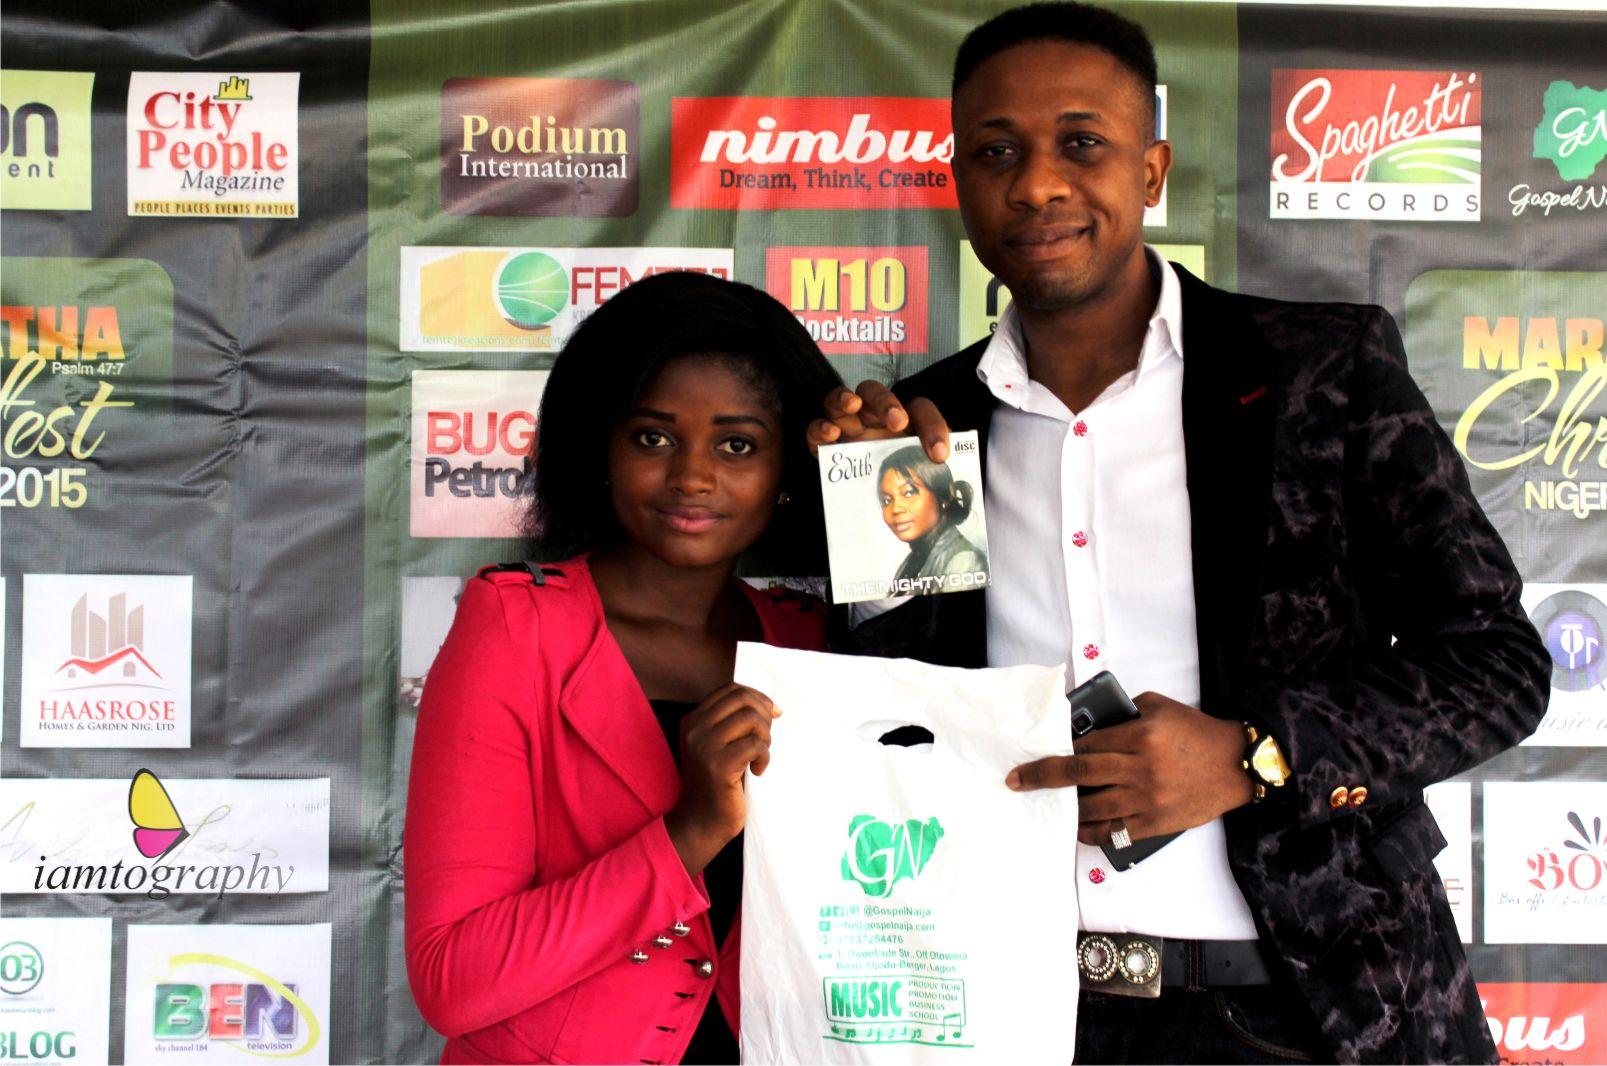 Maranatha ChristFest Nigeria 2015 with @sophiefey (3)